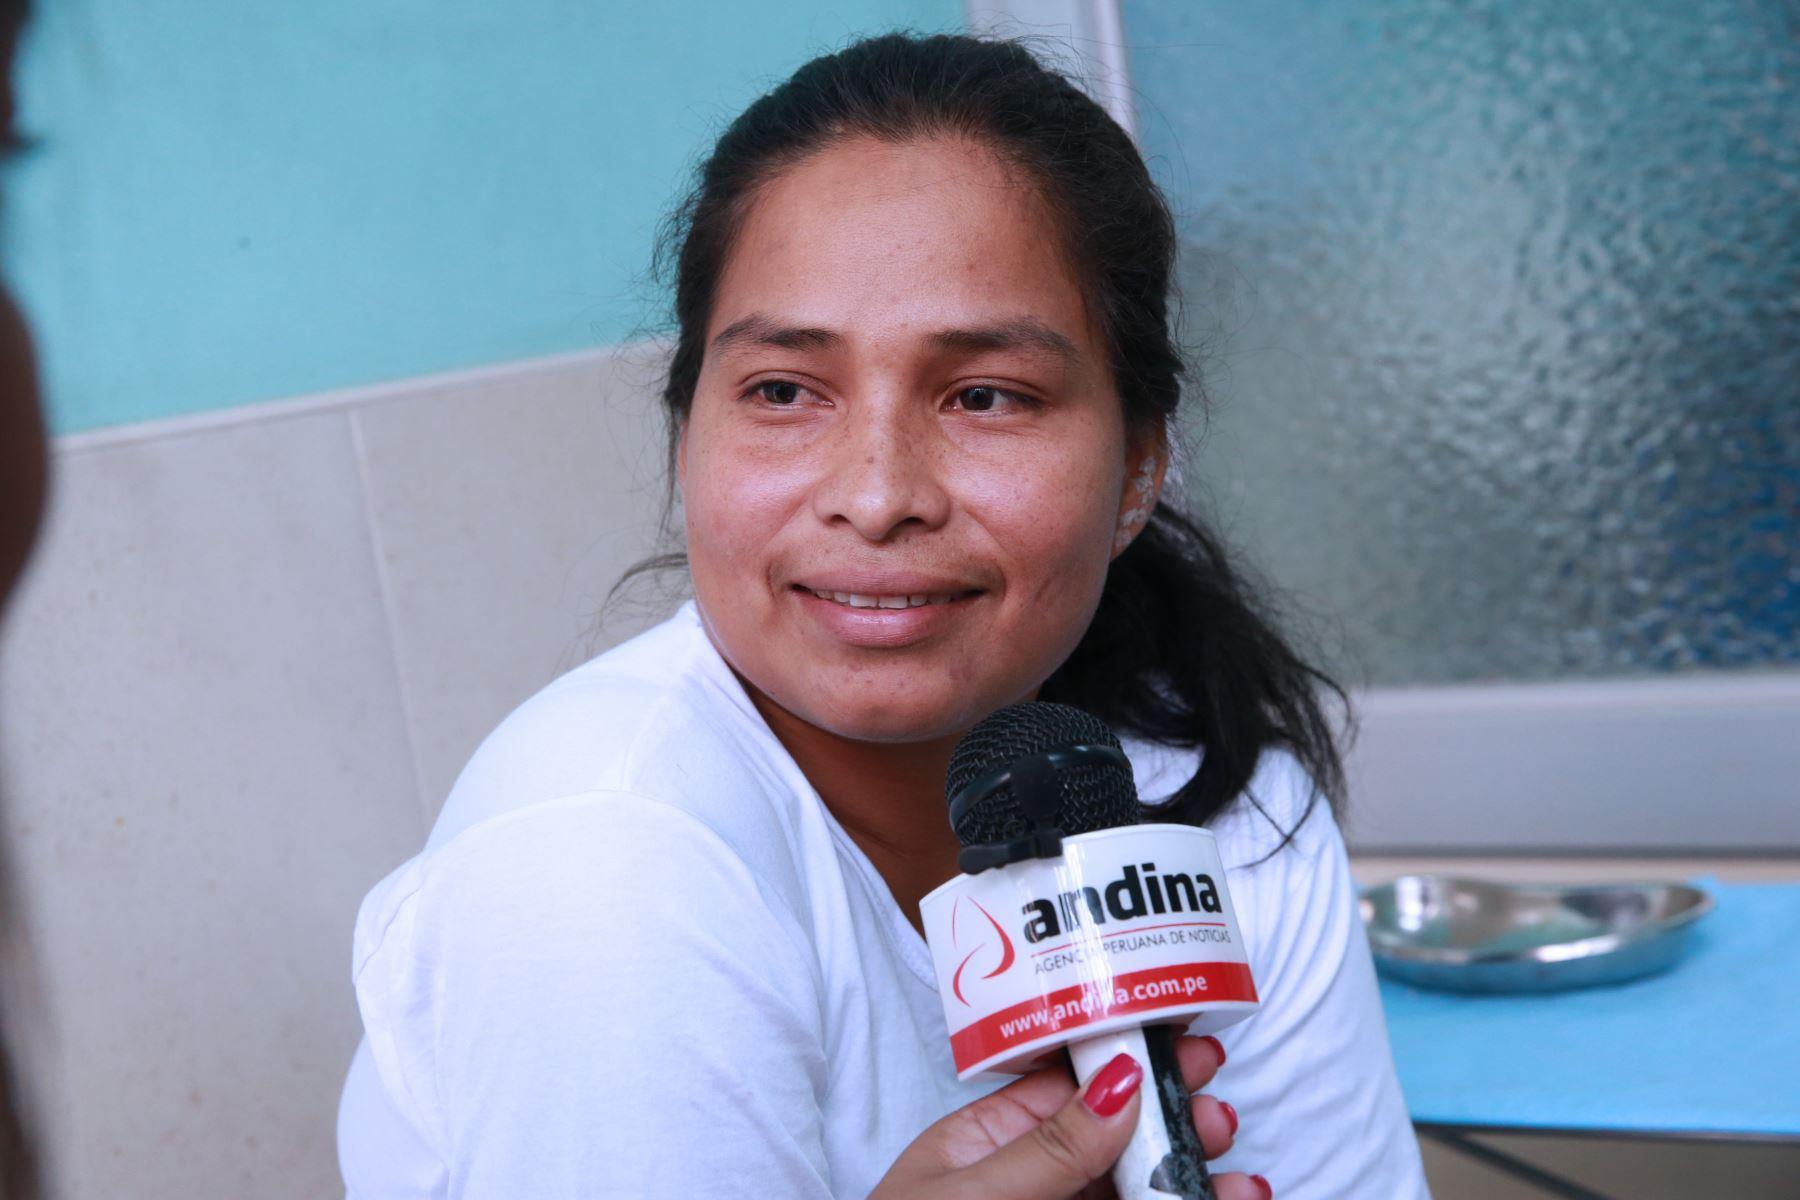 LIMA,PERÚ-MARZO 29.Primera visita medica de Evangelina Chamorro en el hospital Maria Auxiliadora  Foto: ANDINA/Norman Córdova